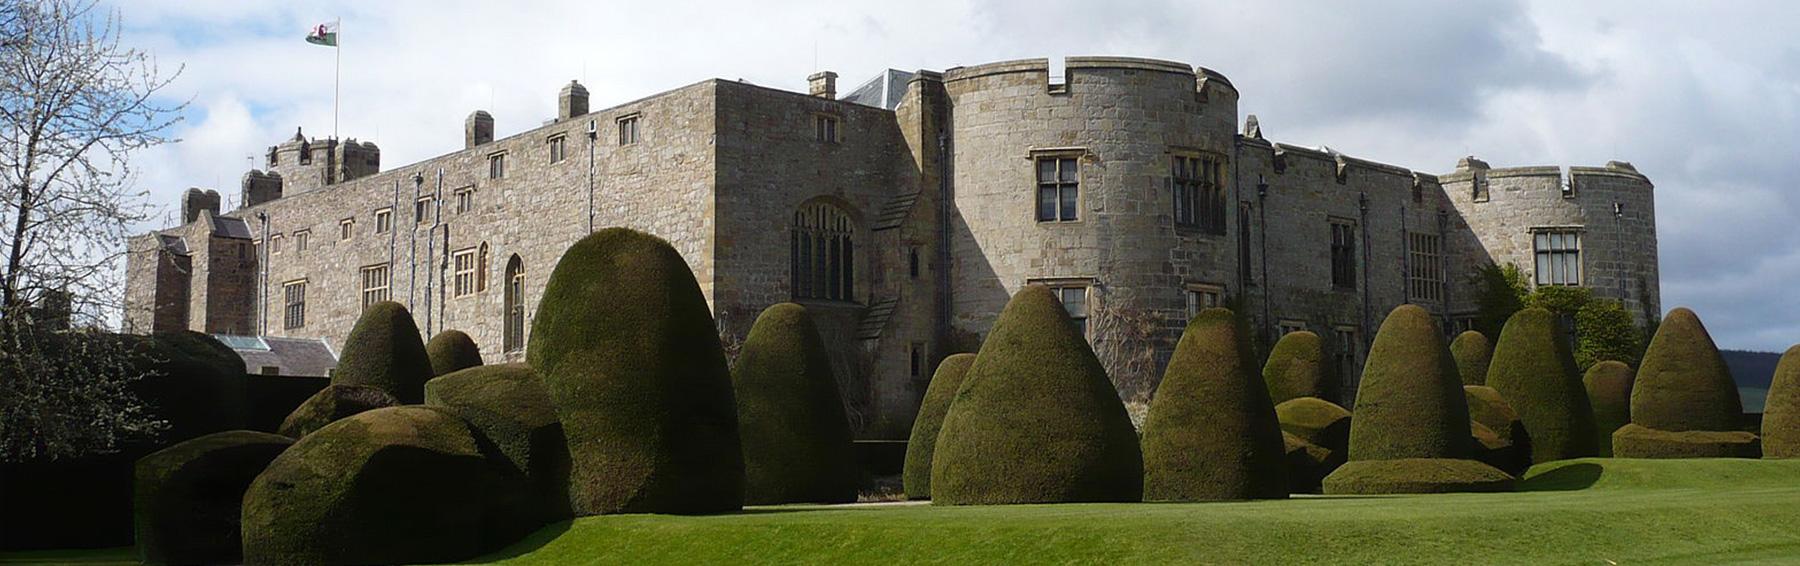 Chirck Castle - Interpretation